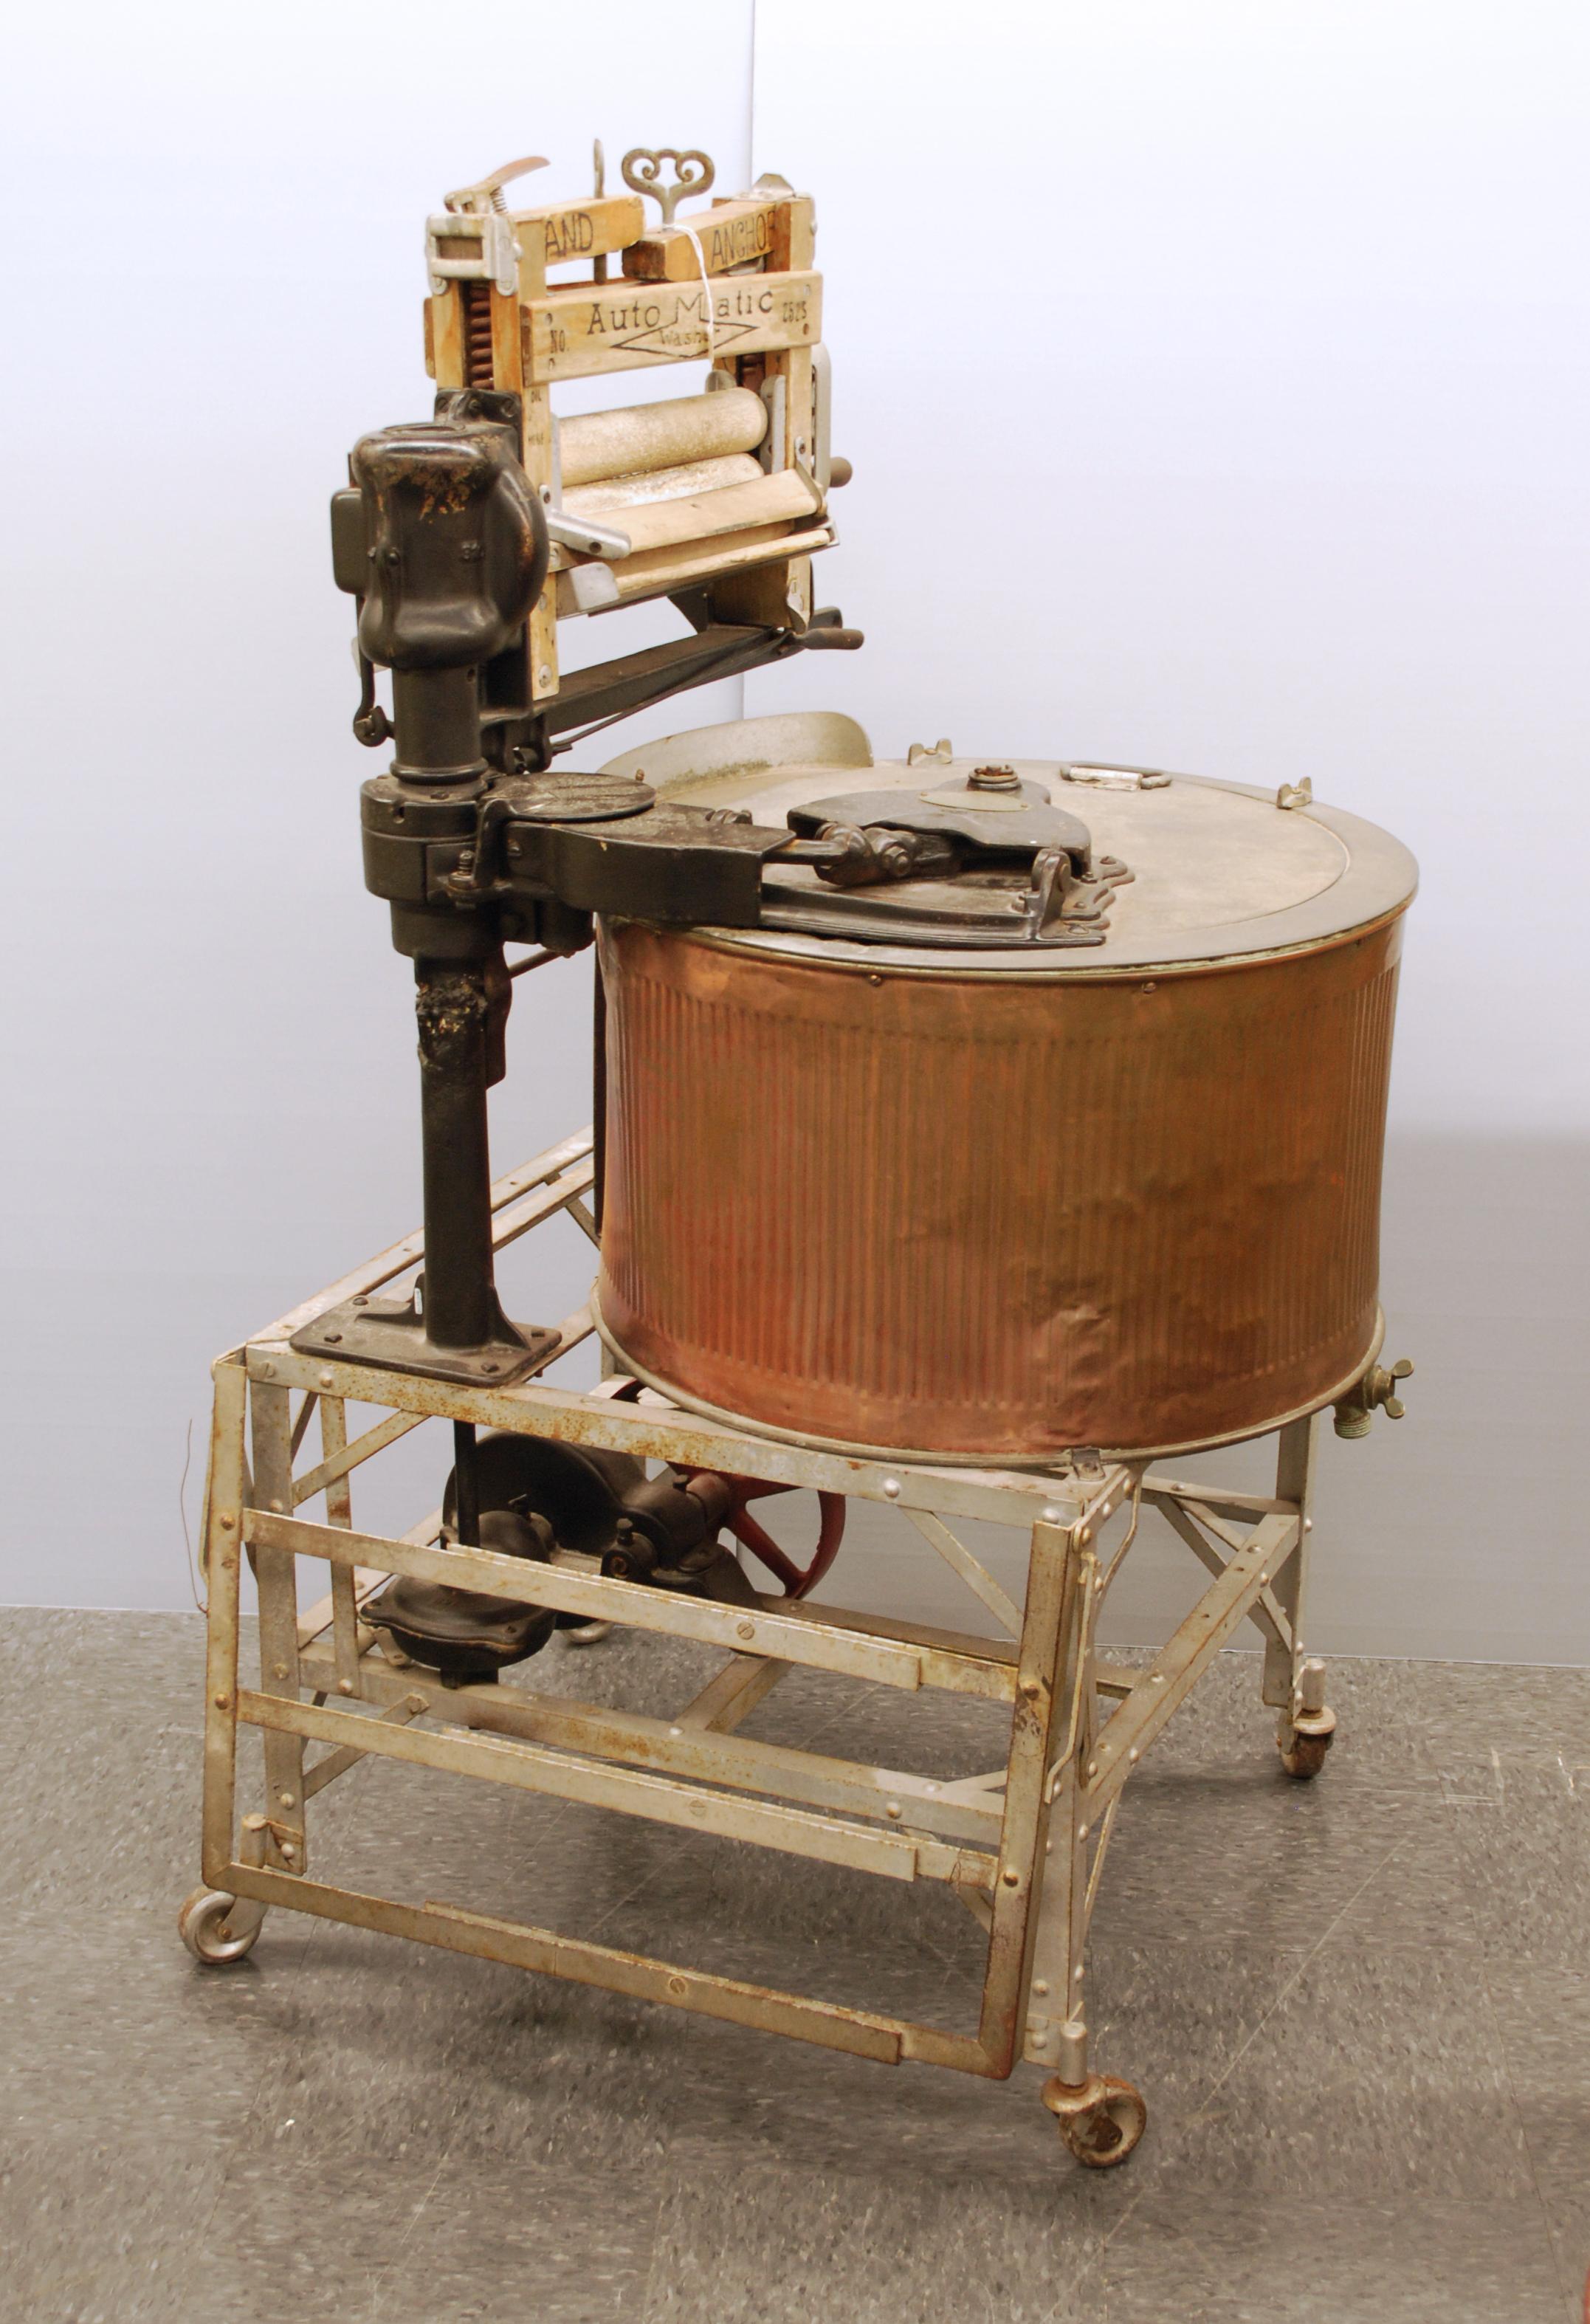 Object: Washing Machine   UTSA Institute Of Texan Cultures